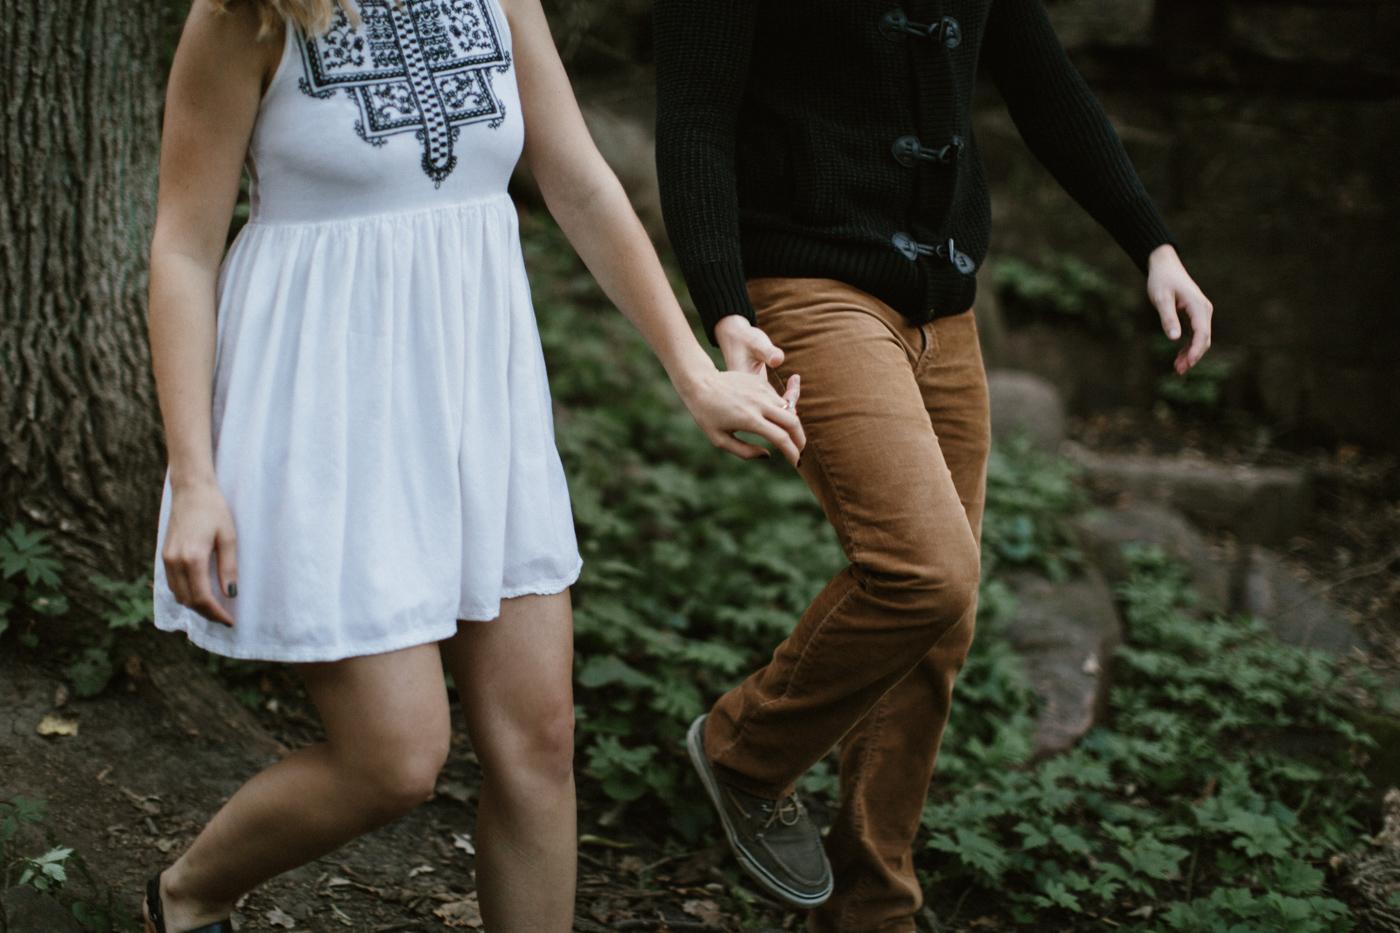 Sioux_Falls_Des_Moines_Engagement_Wedding_Photographer_10.jpg